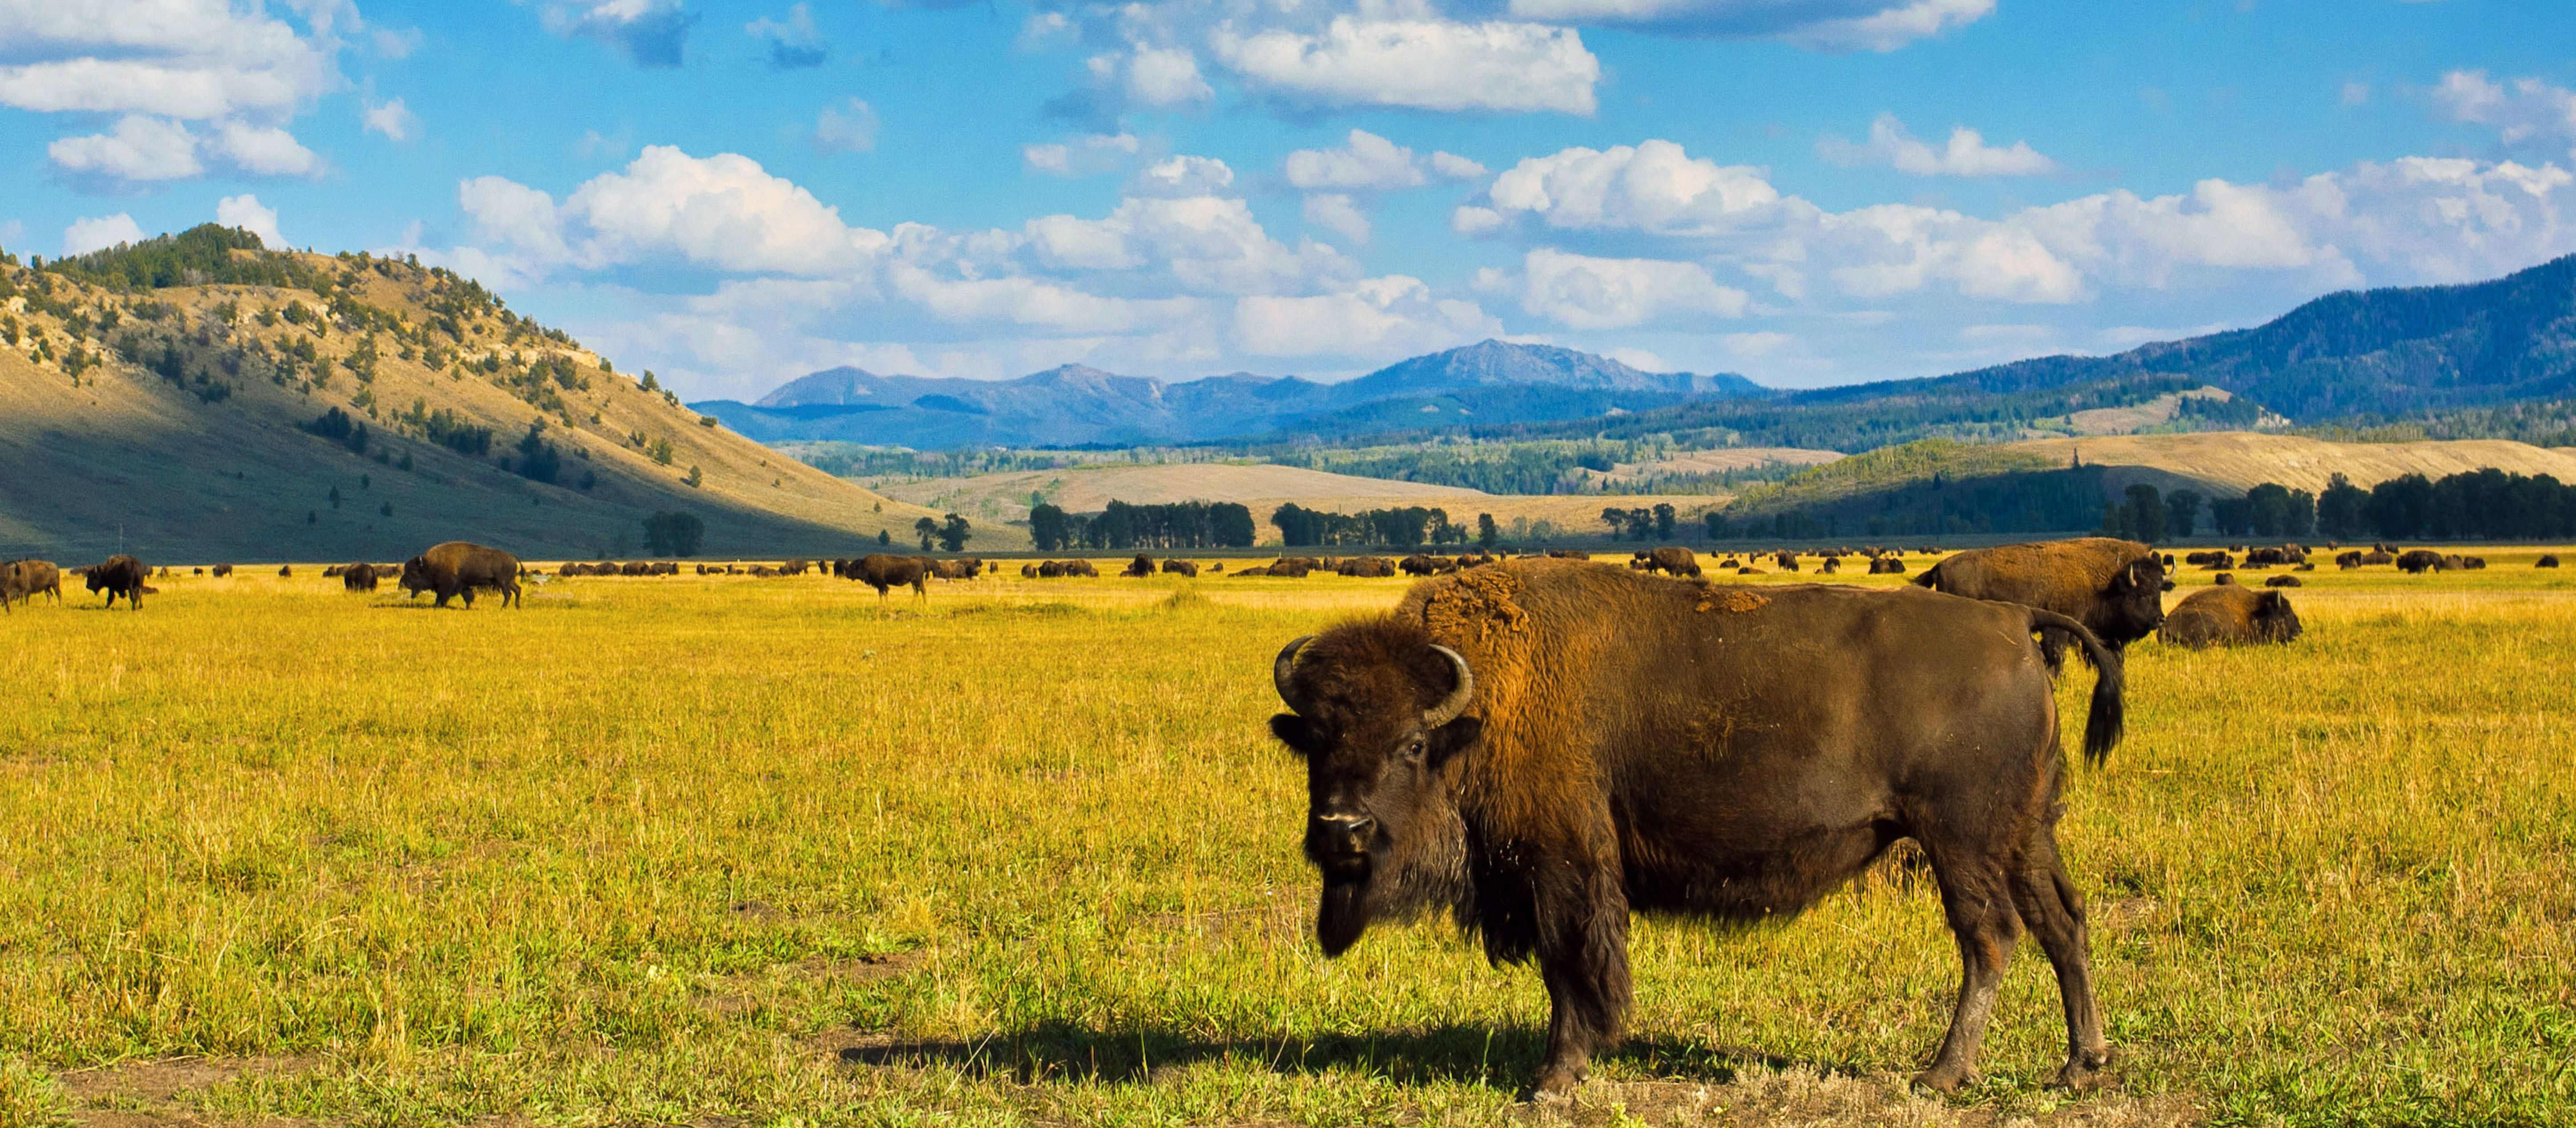 Bison im Yellowstone National Park